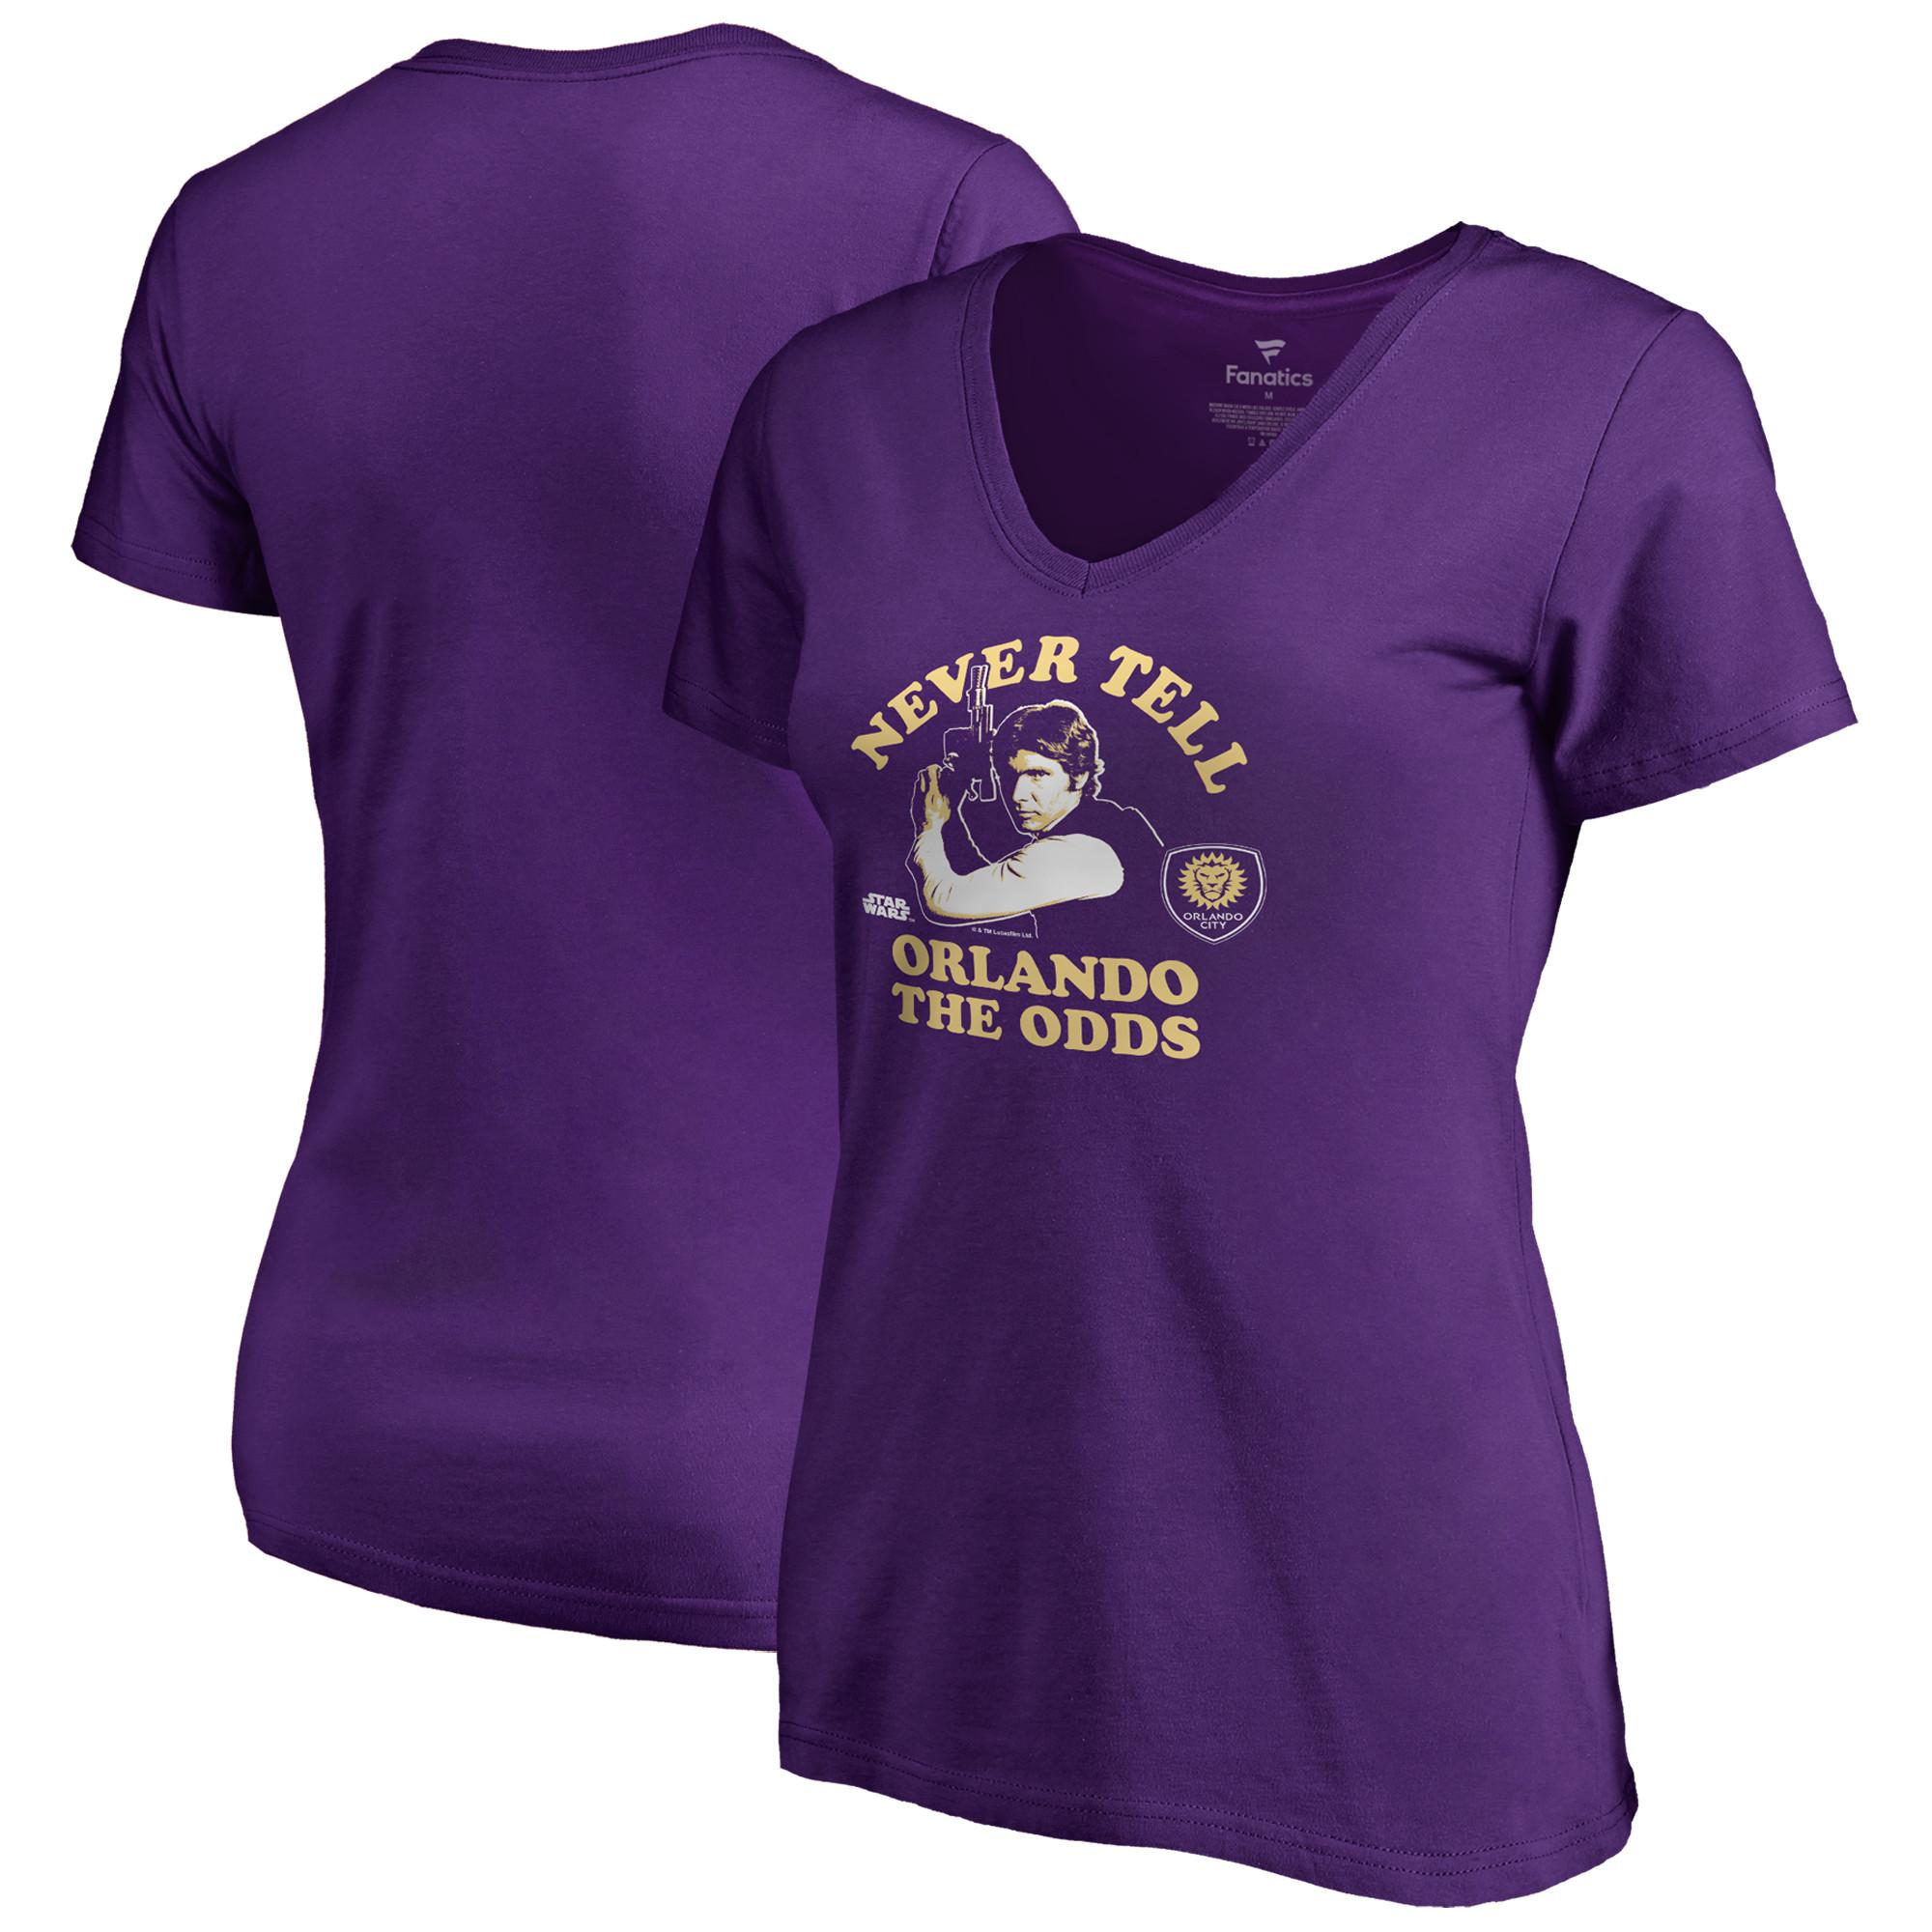 Orlando City SC Fanatics Branded Women's Star Wars Never Tell the Odds V-Neck T-Shirt - Purple